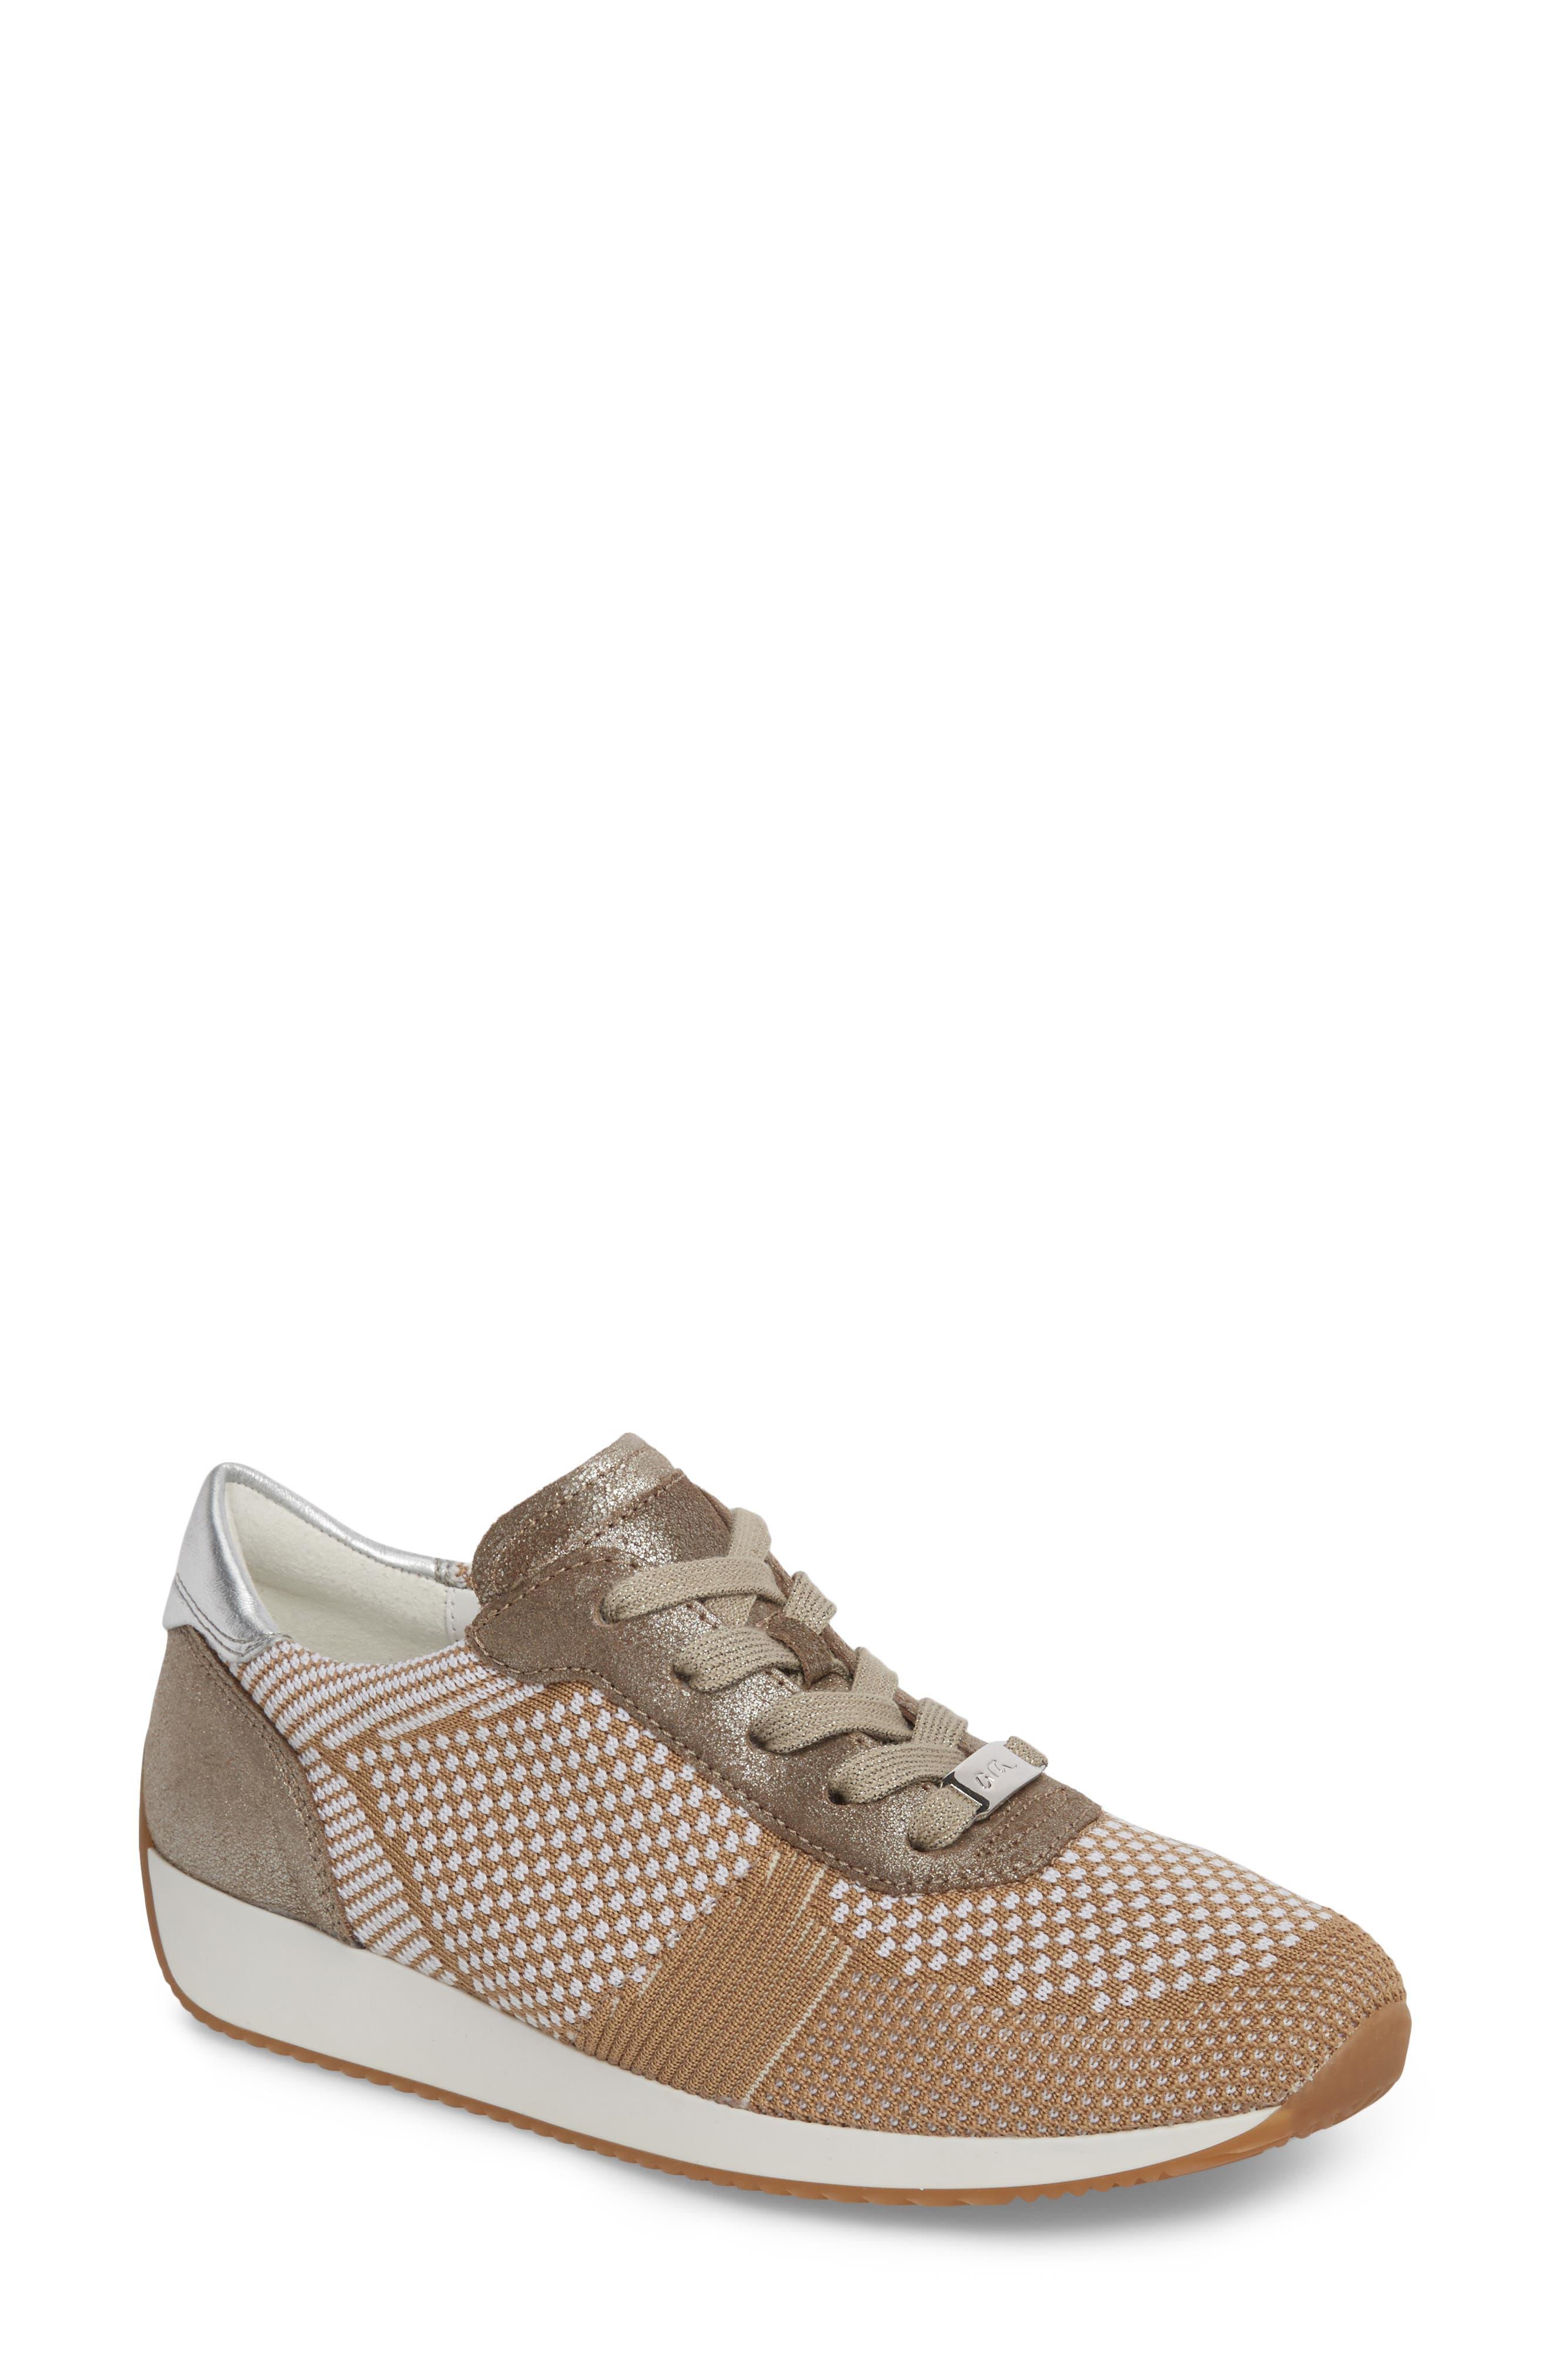 Ara Lilly Sneaker, Metallic